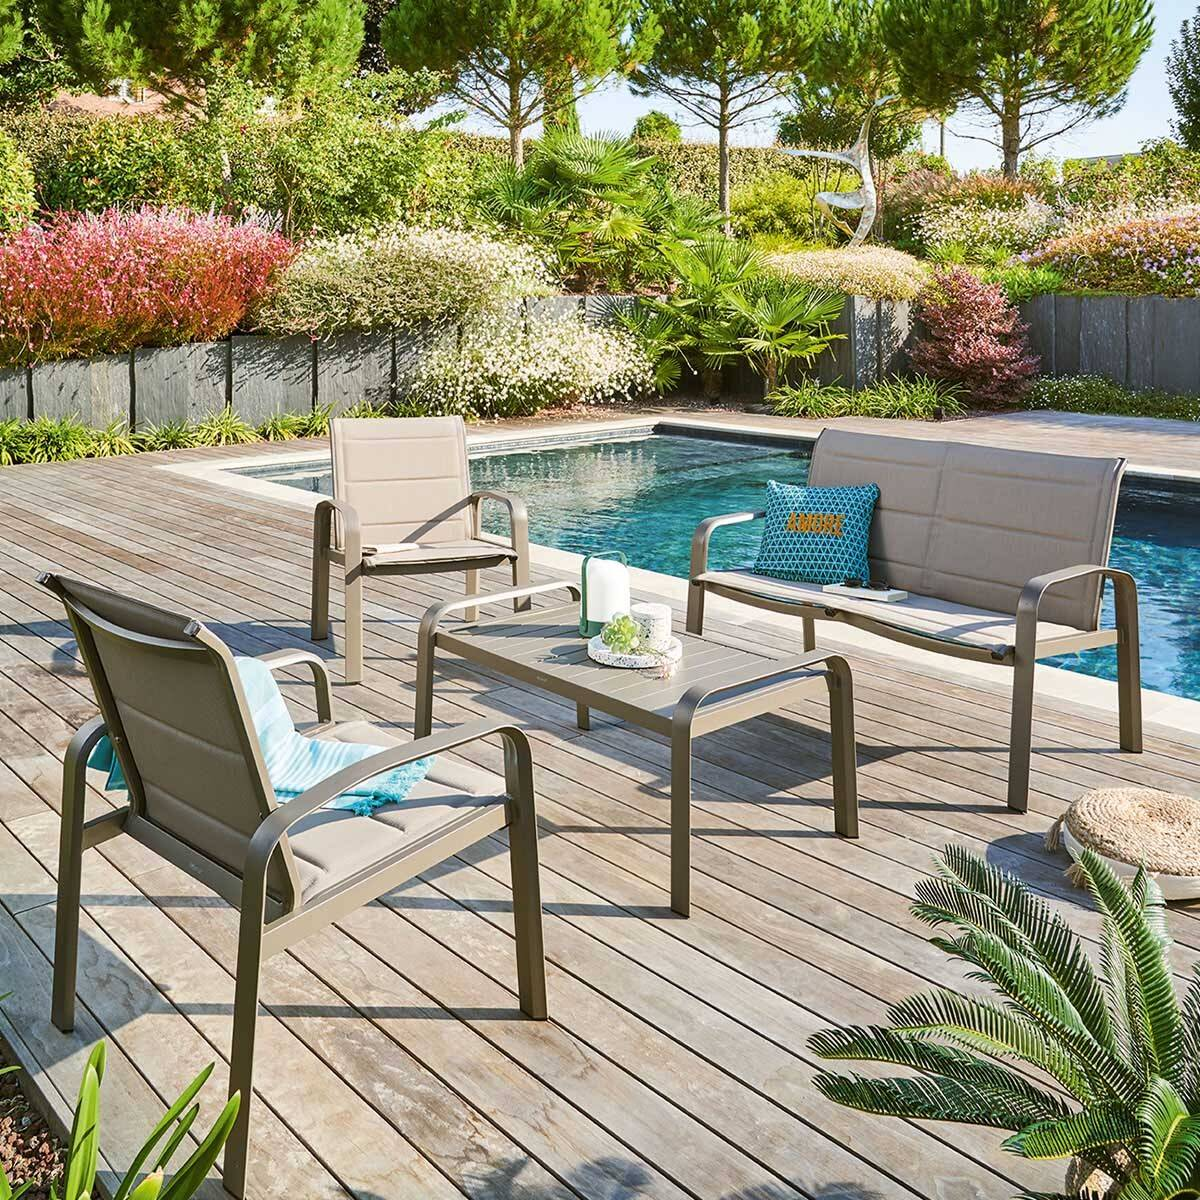 Hespéride Salon de jardin Elyn Noisette   Praline 4 places - Aluminium, Texaline